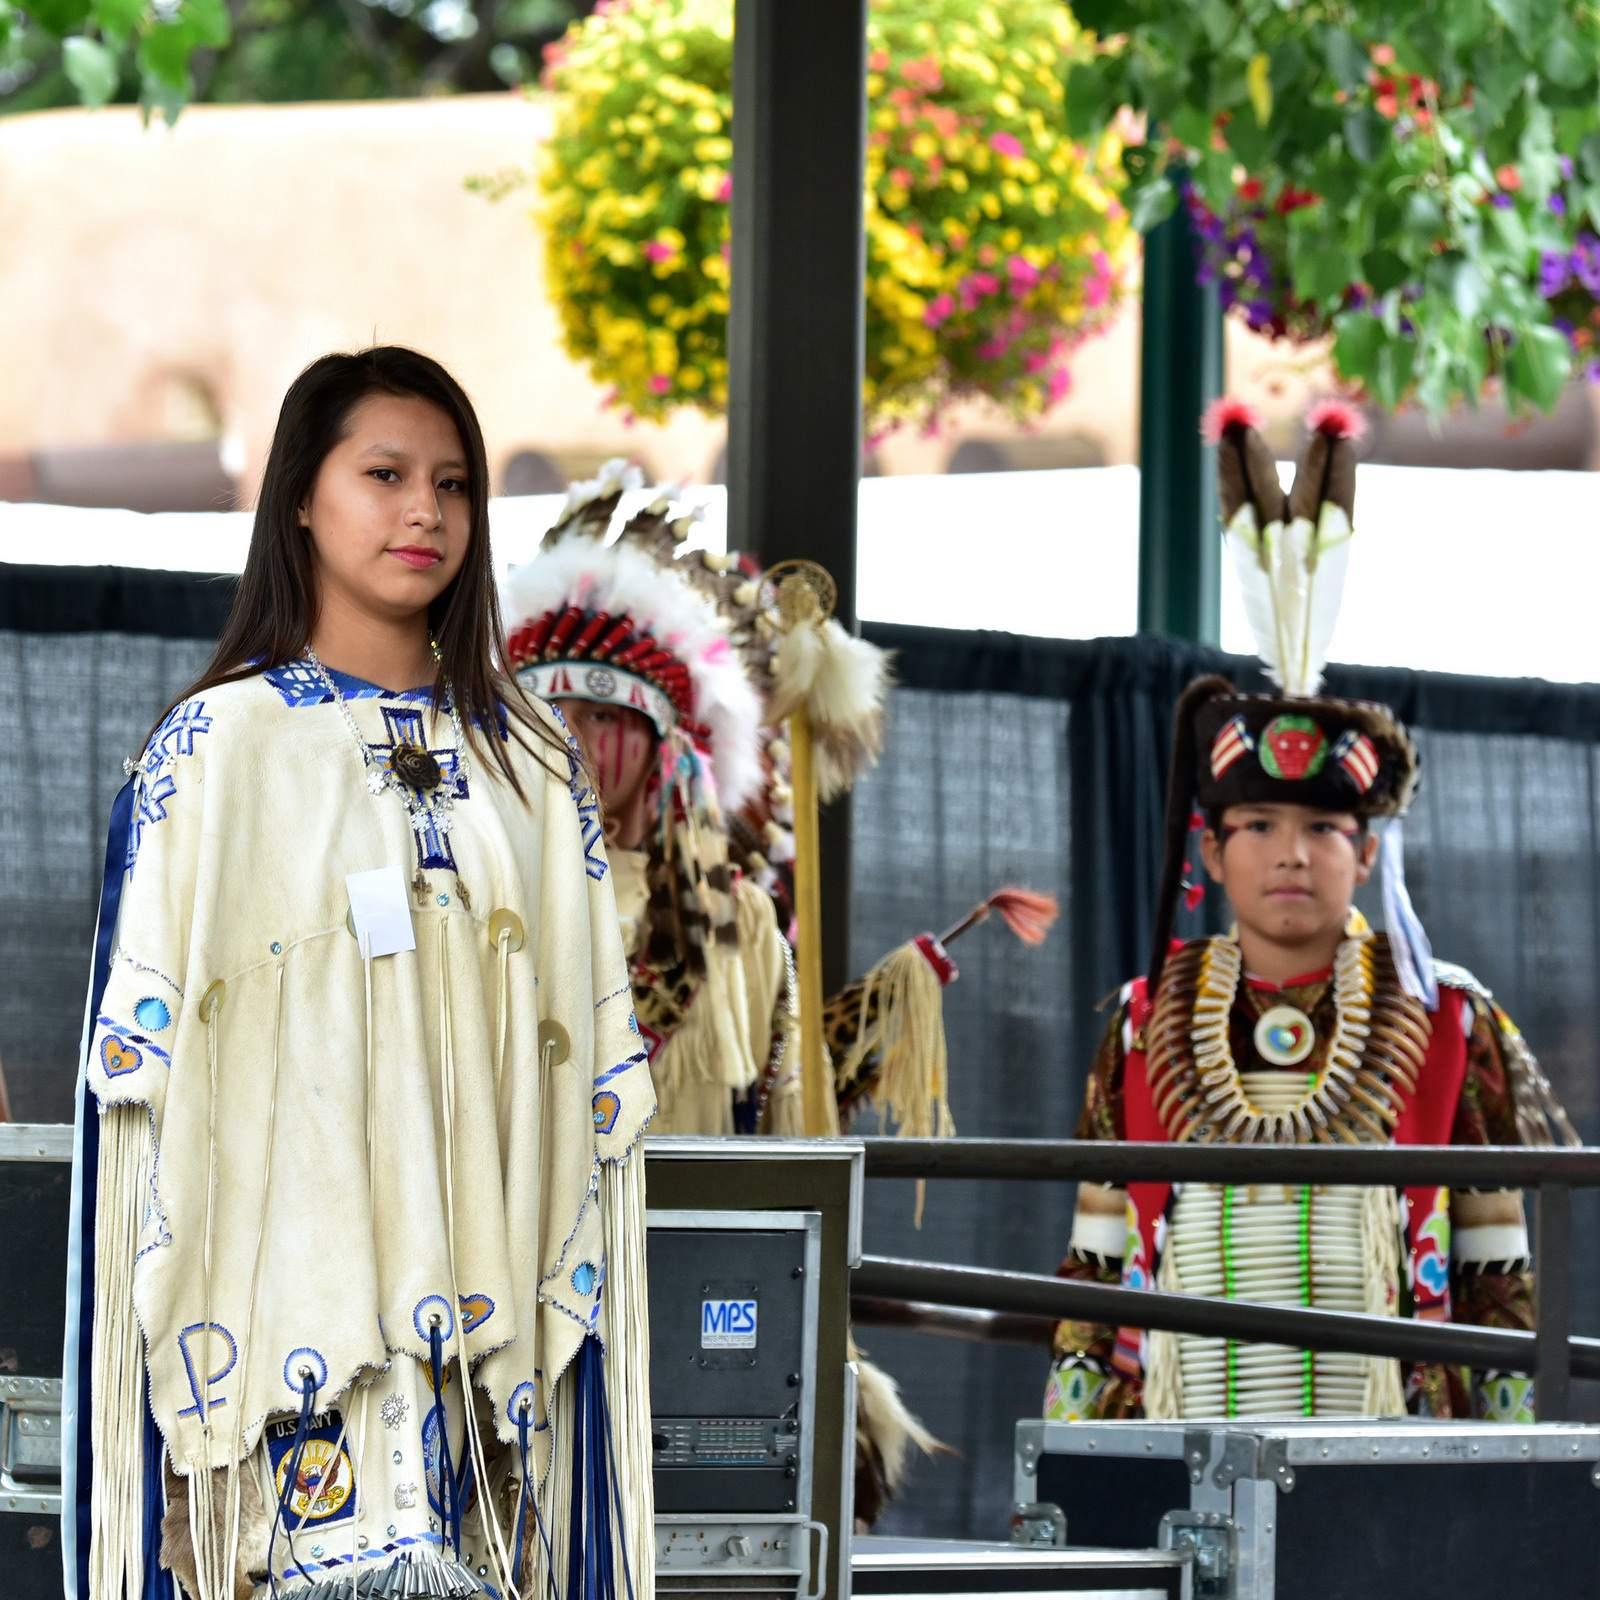 native american clothing2 Native American Clothing Contest at Santa Fe Indian Market